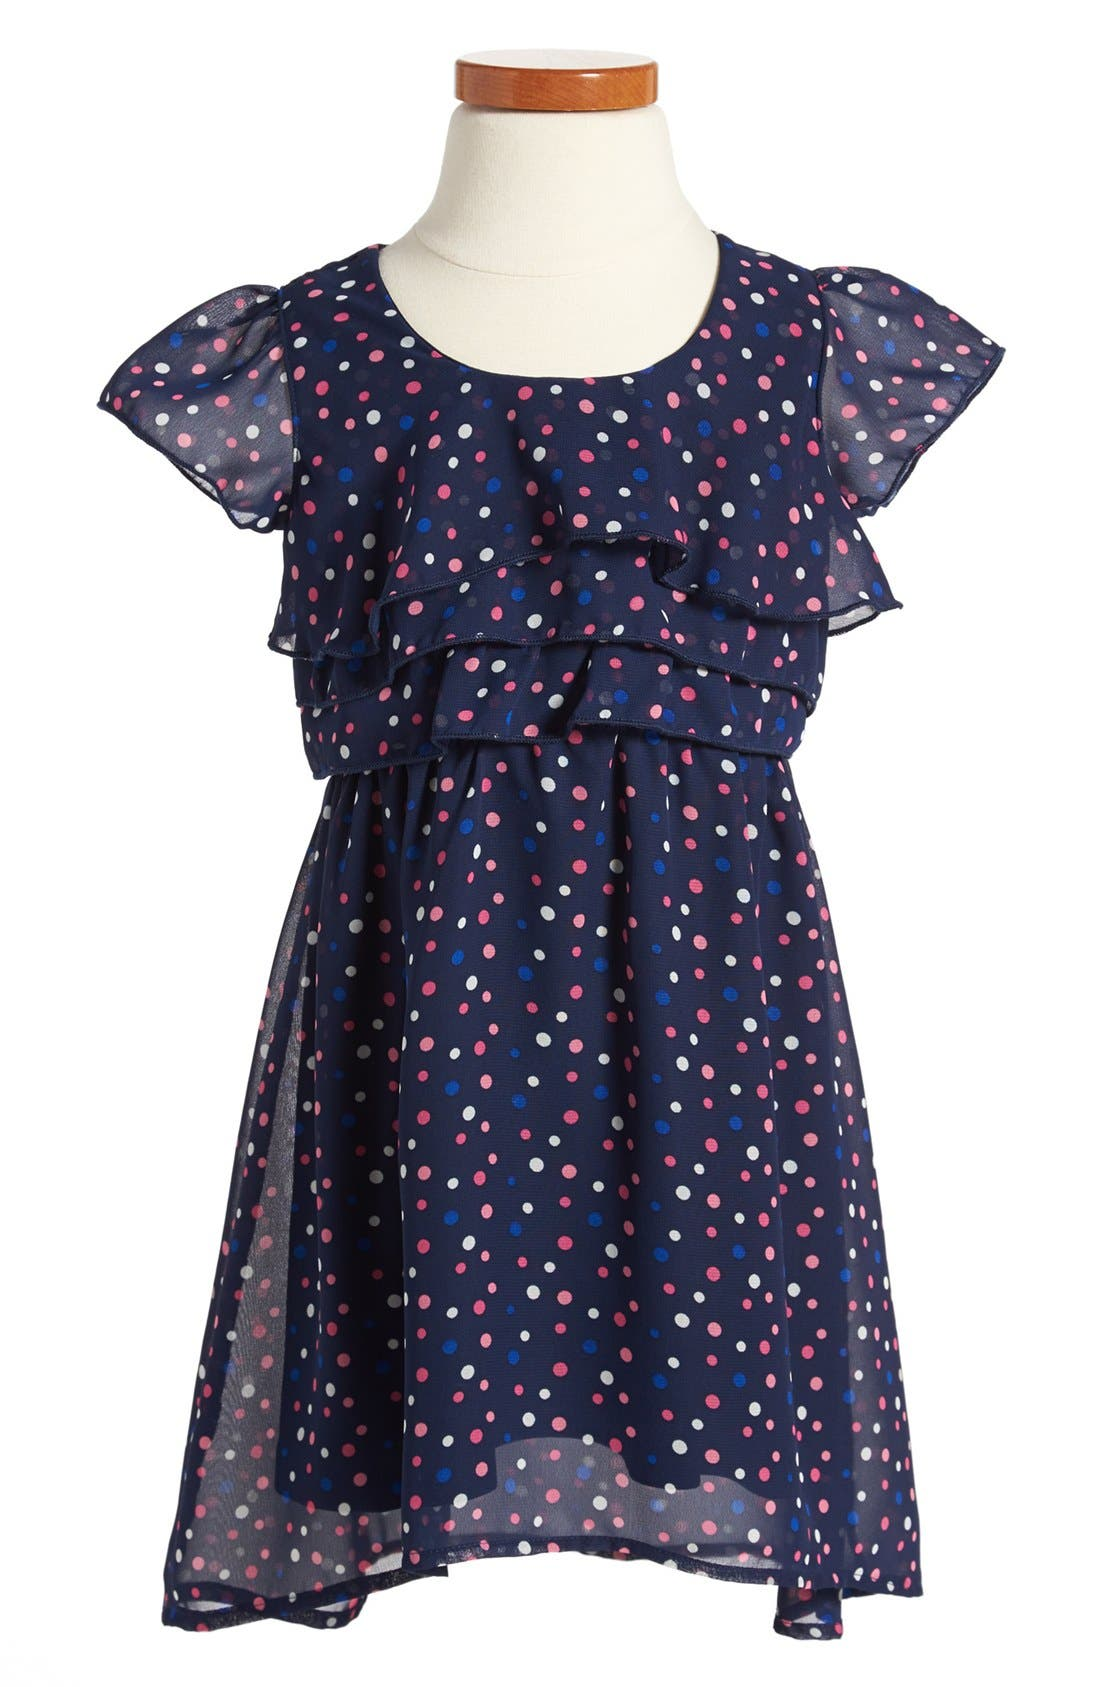 Alternate Image 1 Selected - Weavers Polka Dot Chiffon Dress (Toddler Girls)